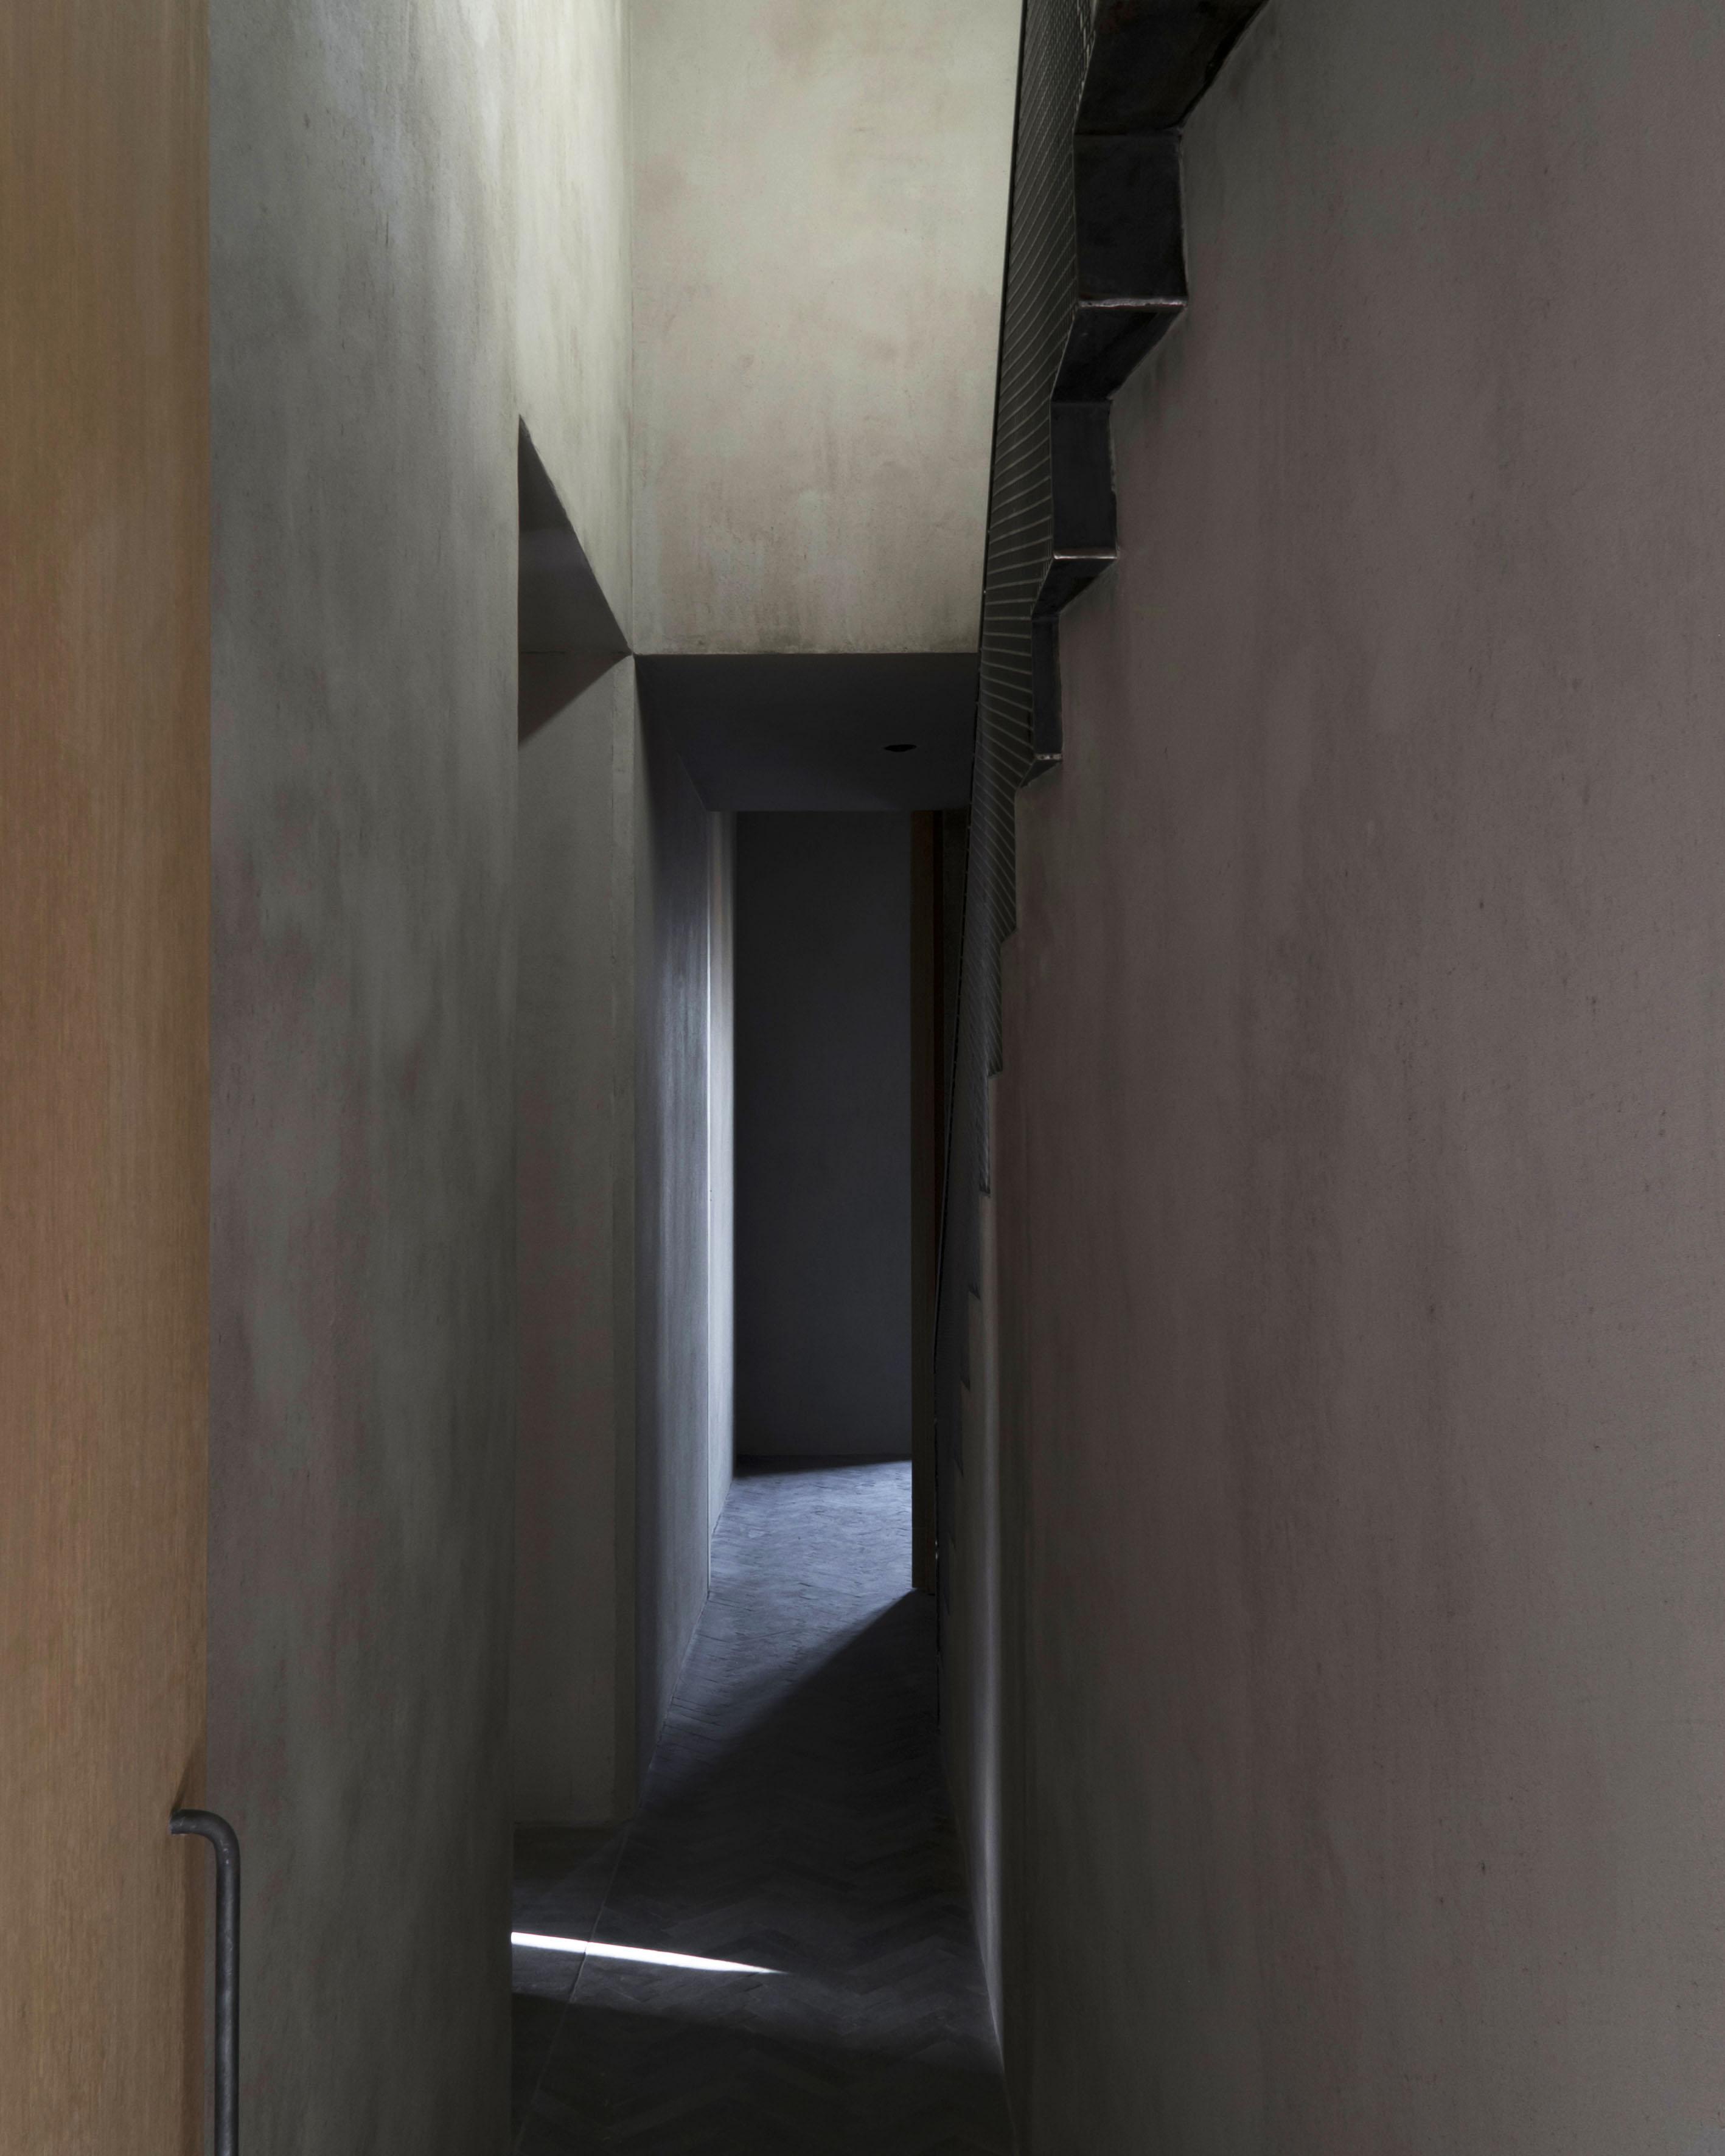 Passageway to Sleeping Areas